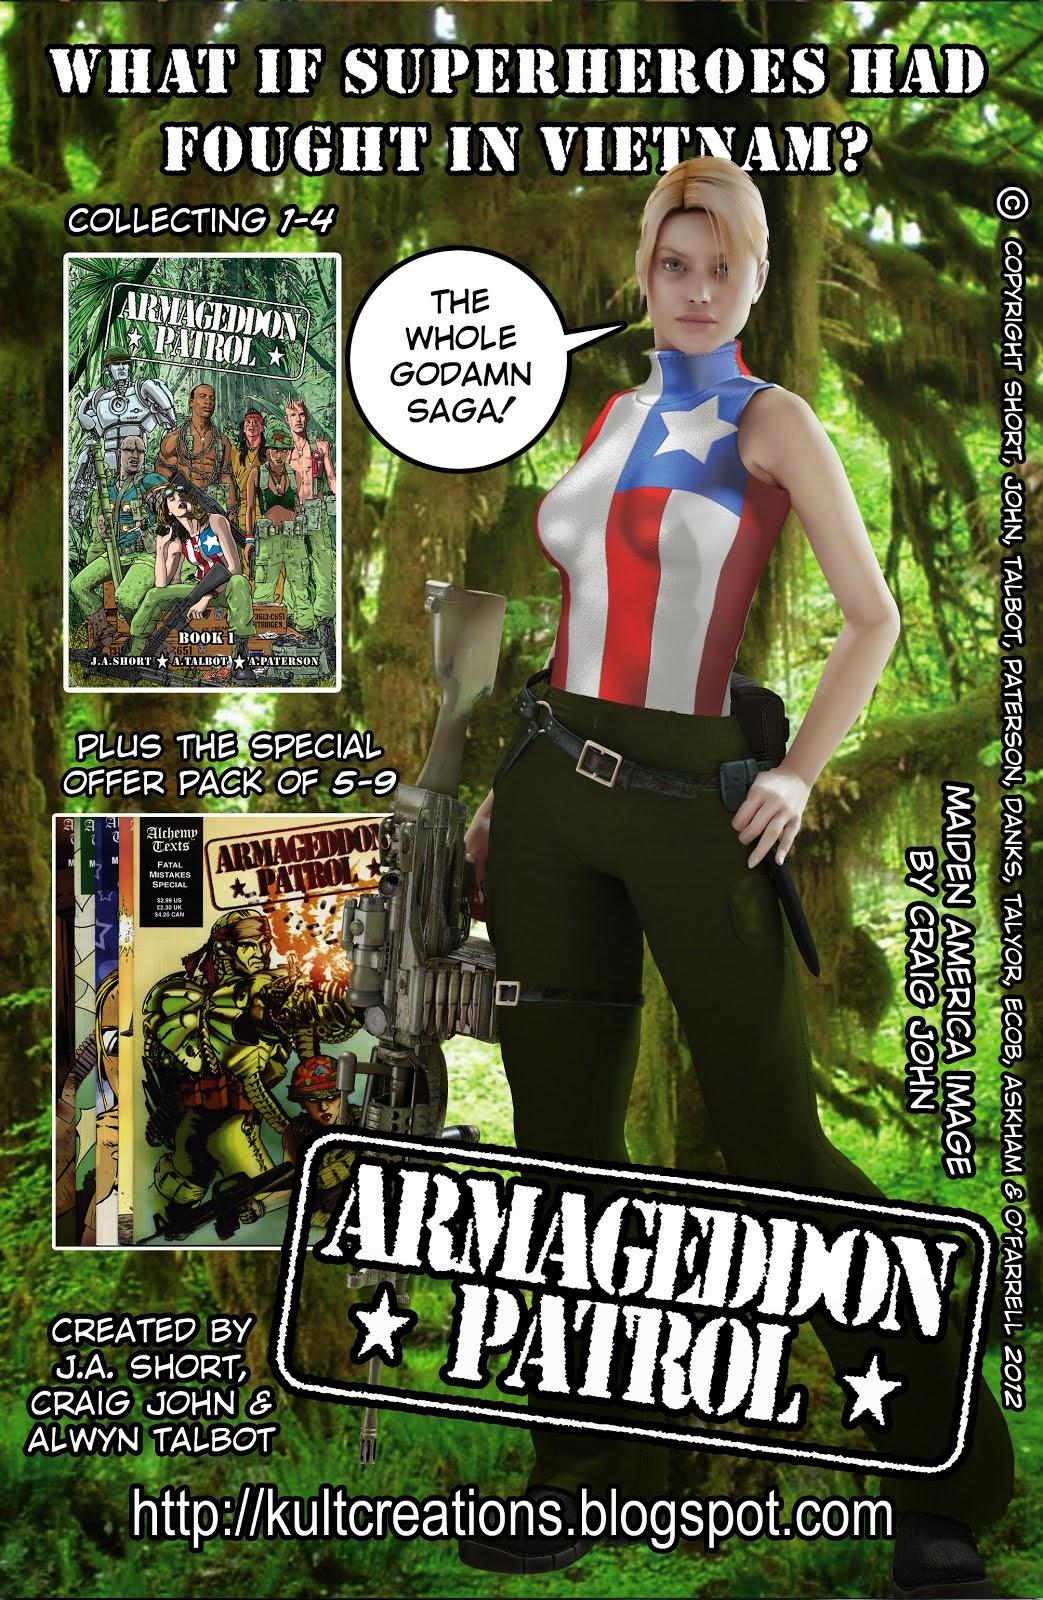 ARMAGEDDON PATROL AD